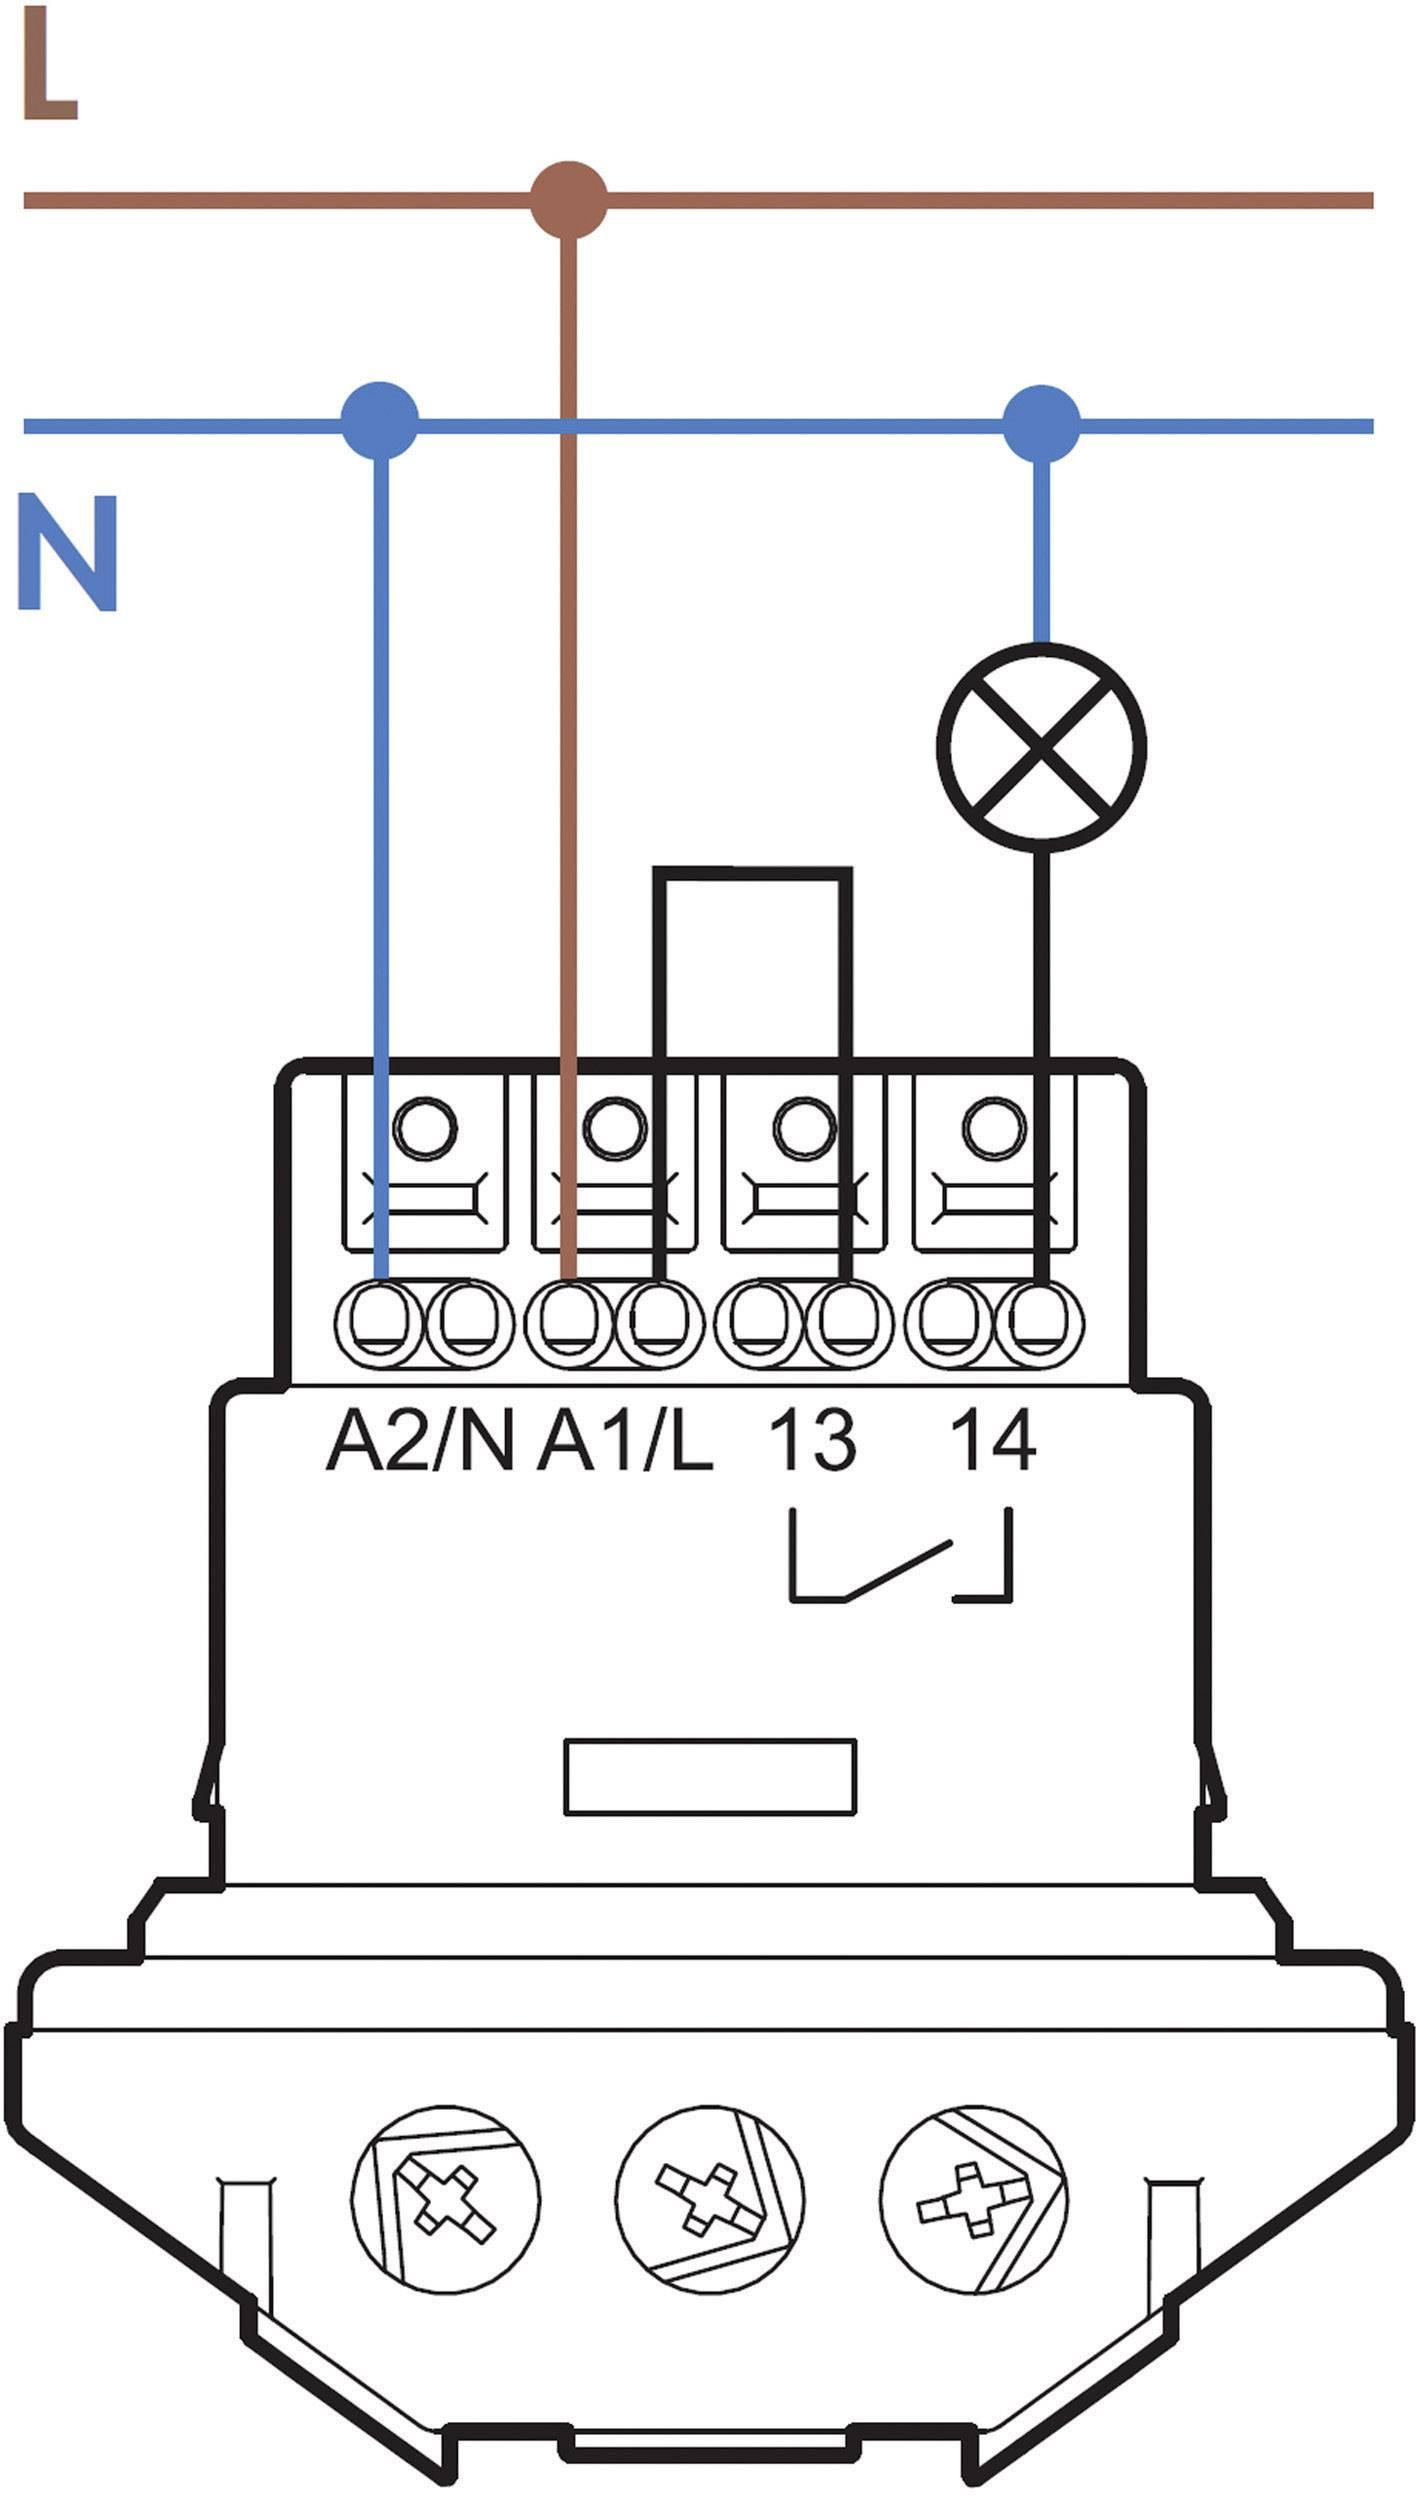 Detektor pohybu Finder 18.61.8.230.0300, 250 V/AC, Max. dosah 9 m